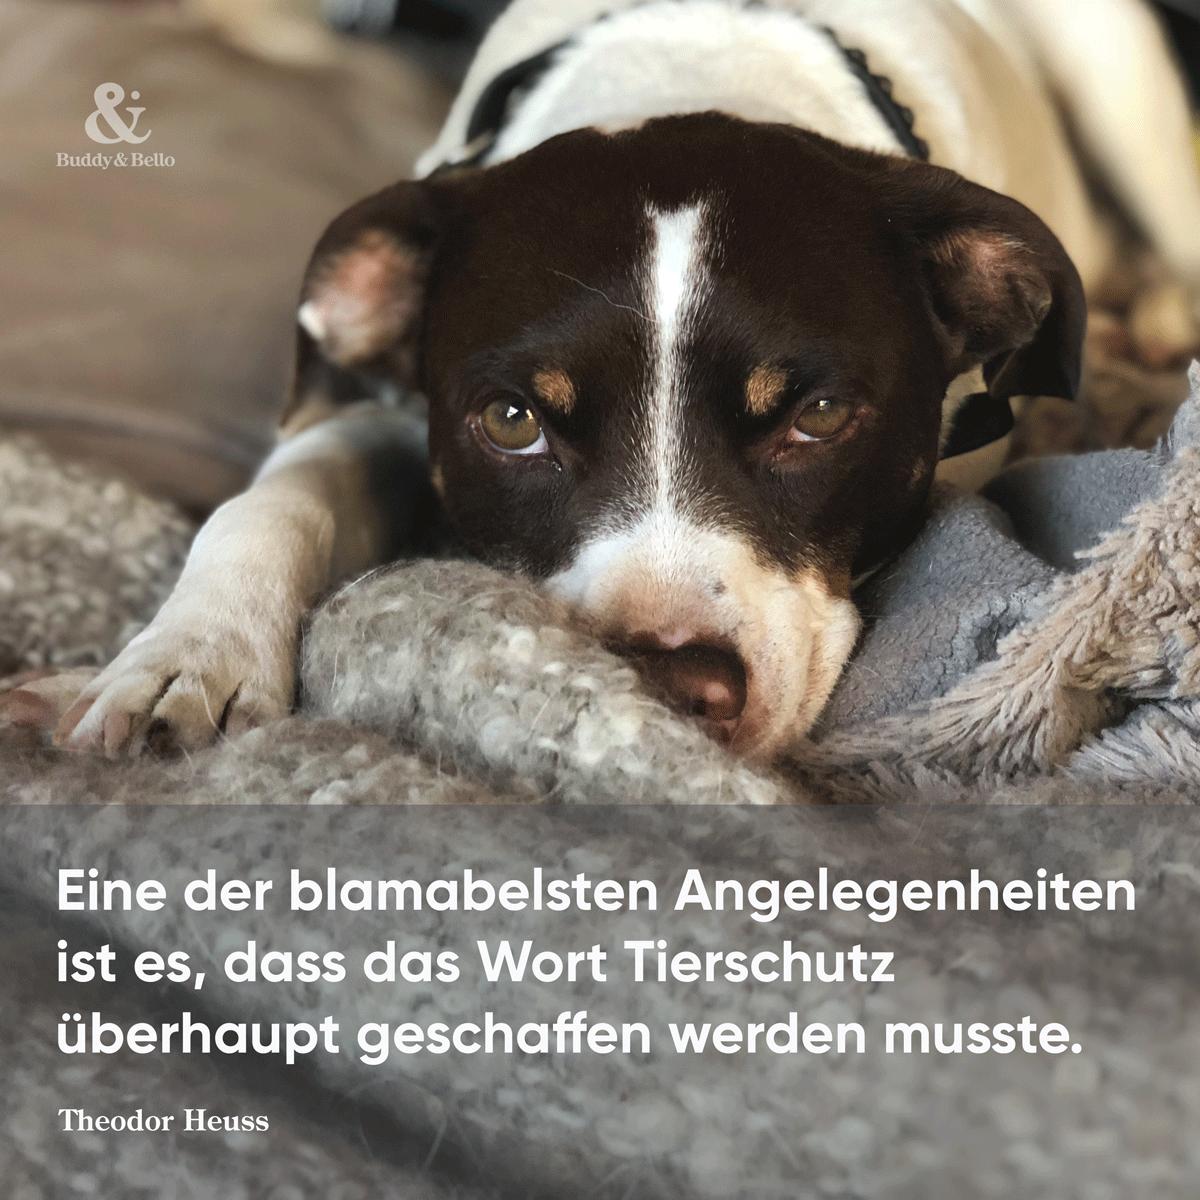 buddyandbello_tierschutz.png